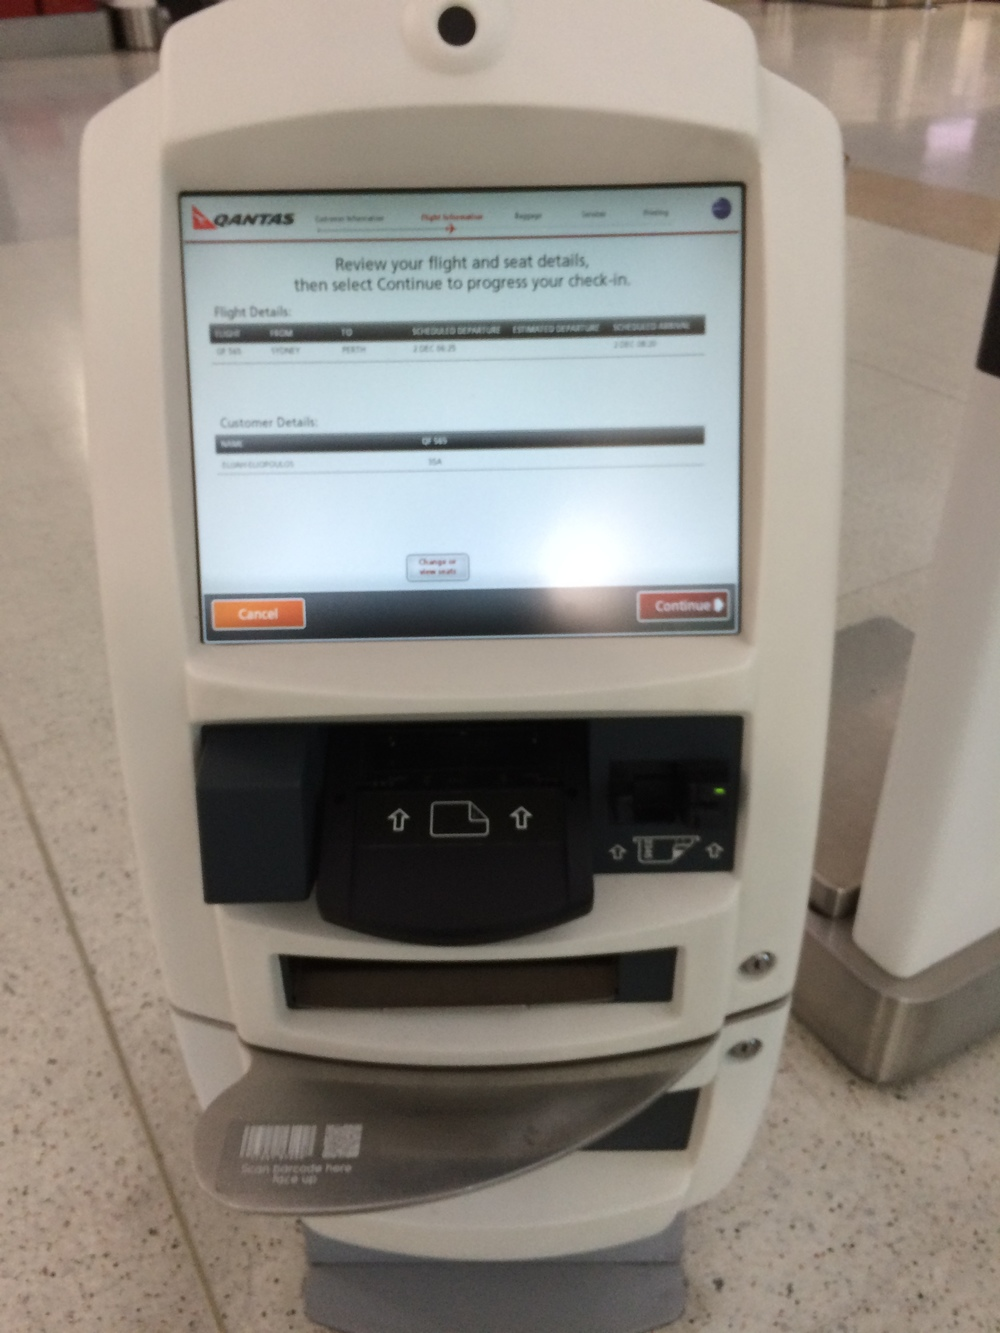 Qantas Check-in Kiosk